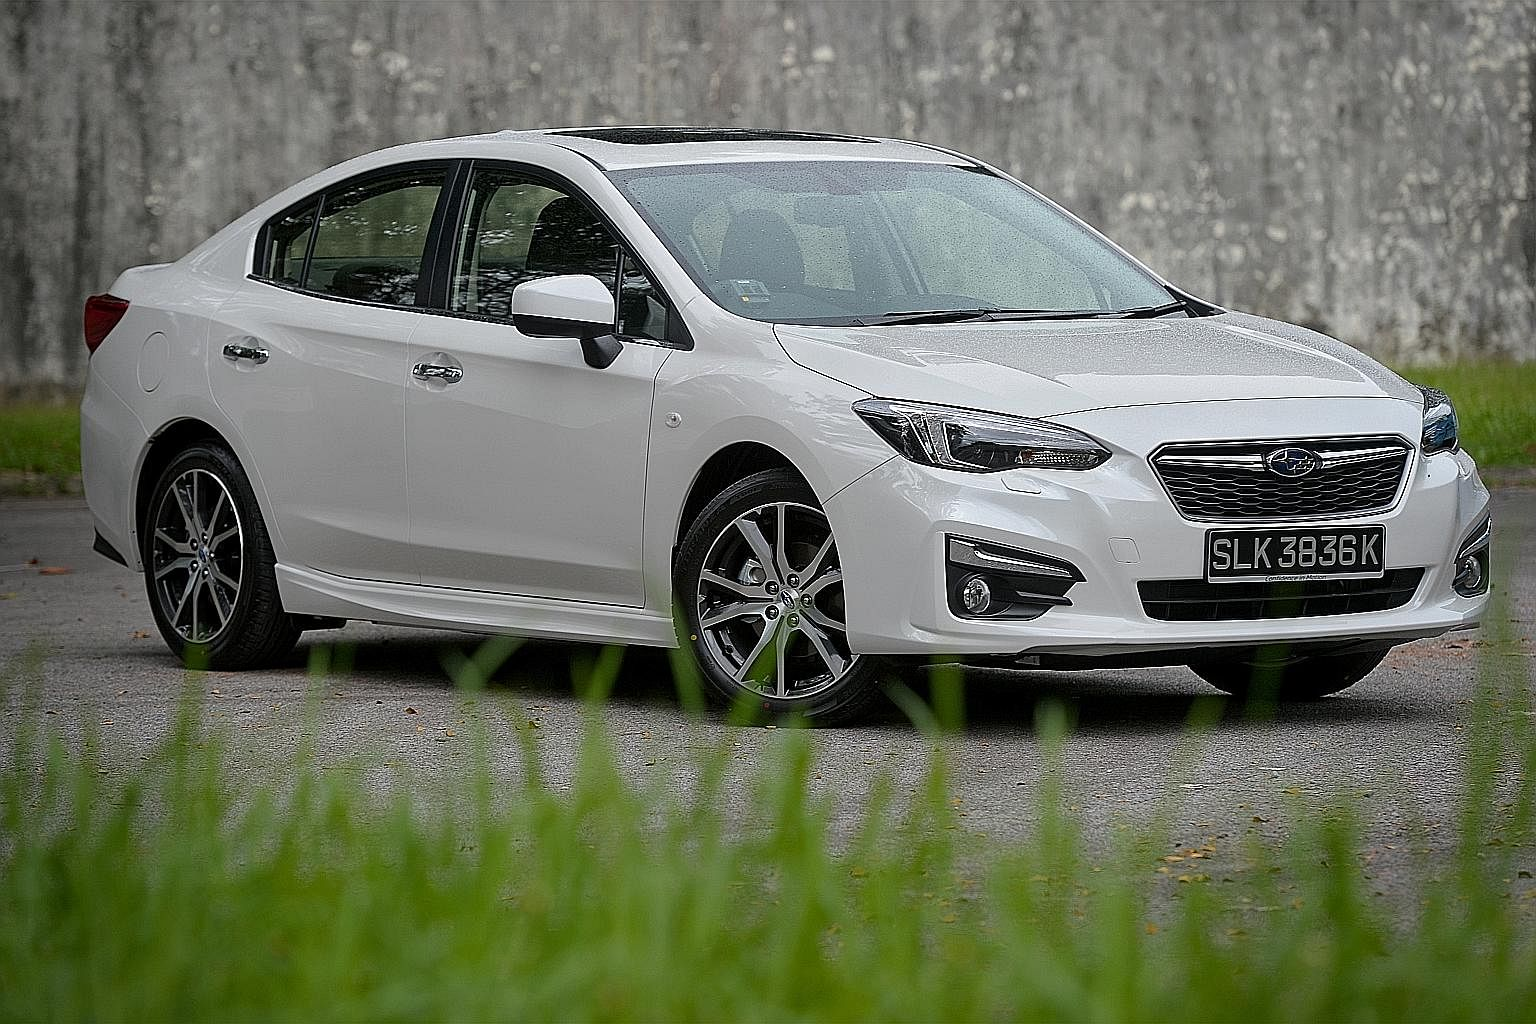 Renault Megane Sedan, Toyota Corolla Altis, Subaru Impreza and Mazda 2.